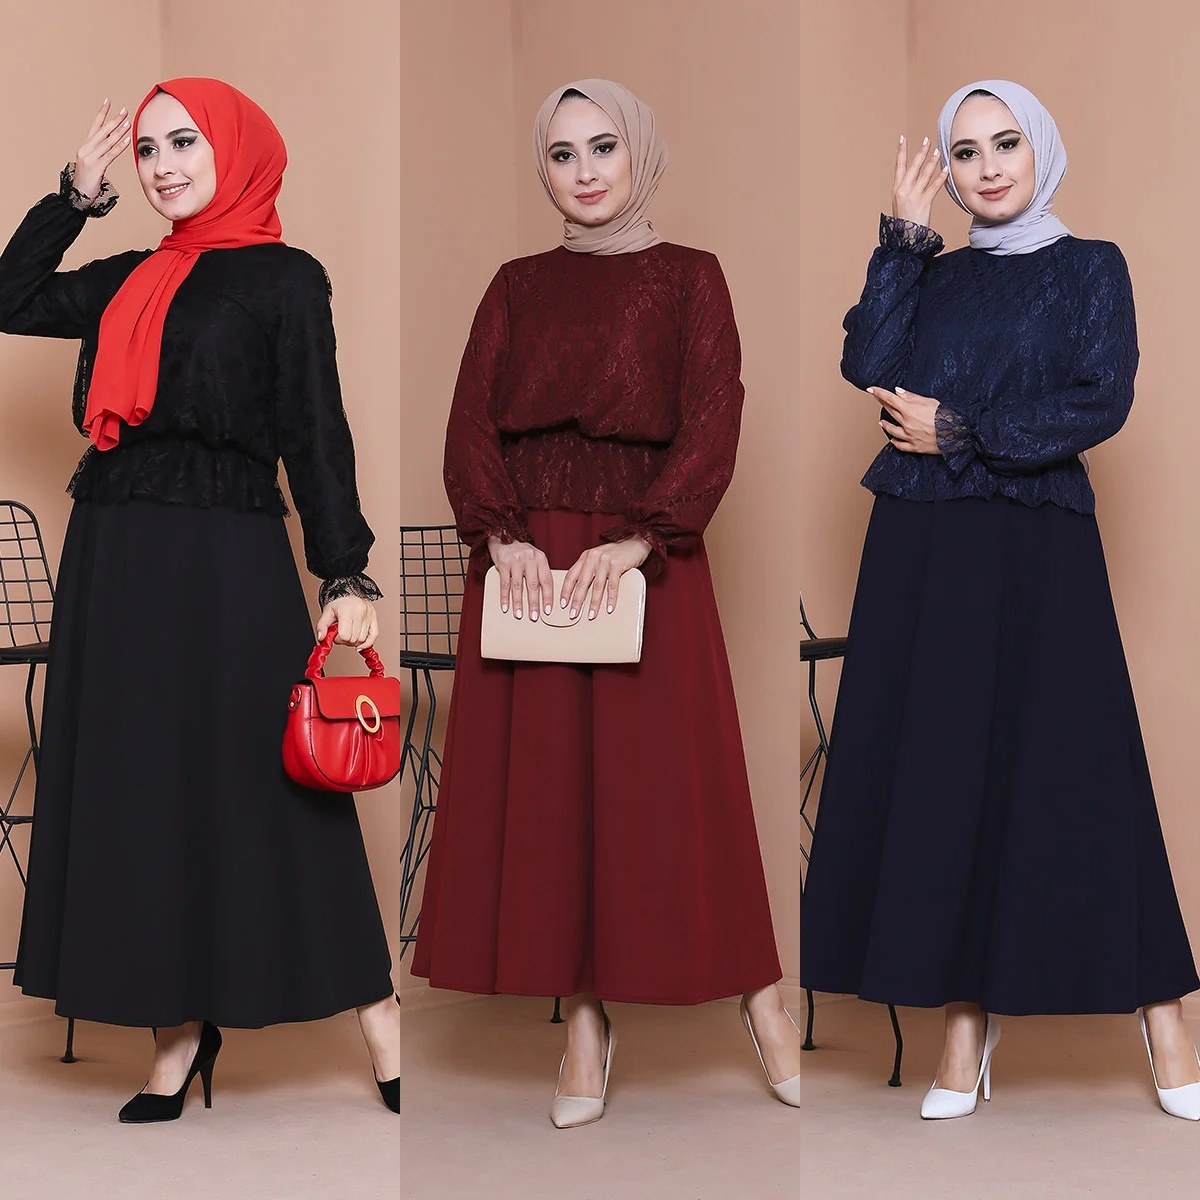 2 Pcs Women Sets Long Skirts and Lace Tops Tunic Muslim Fashion Ramadan Double Suit Dresses Hijab Turkey Abayas Islamic Clothing